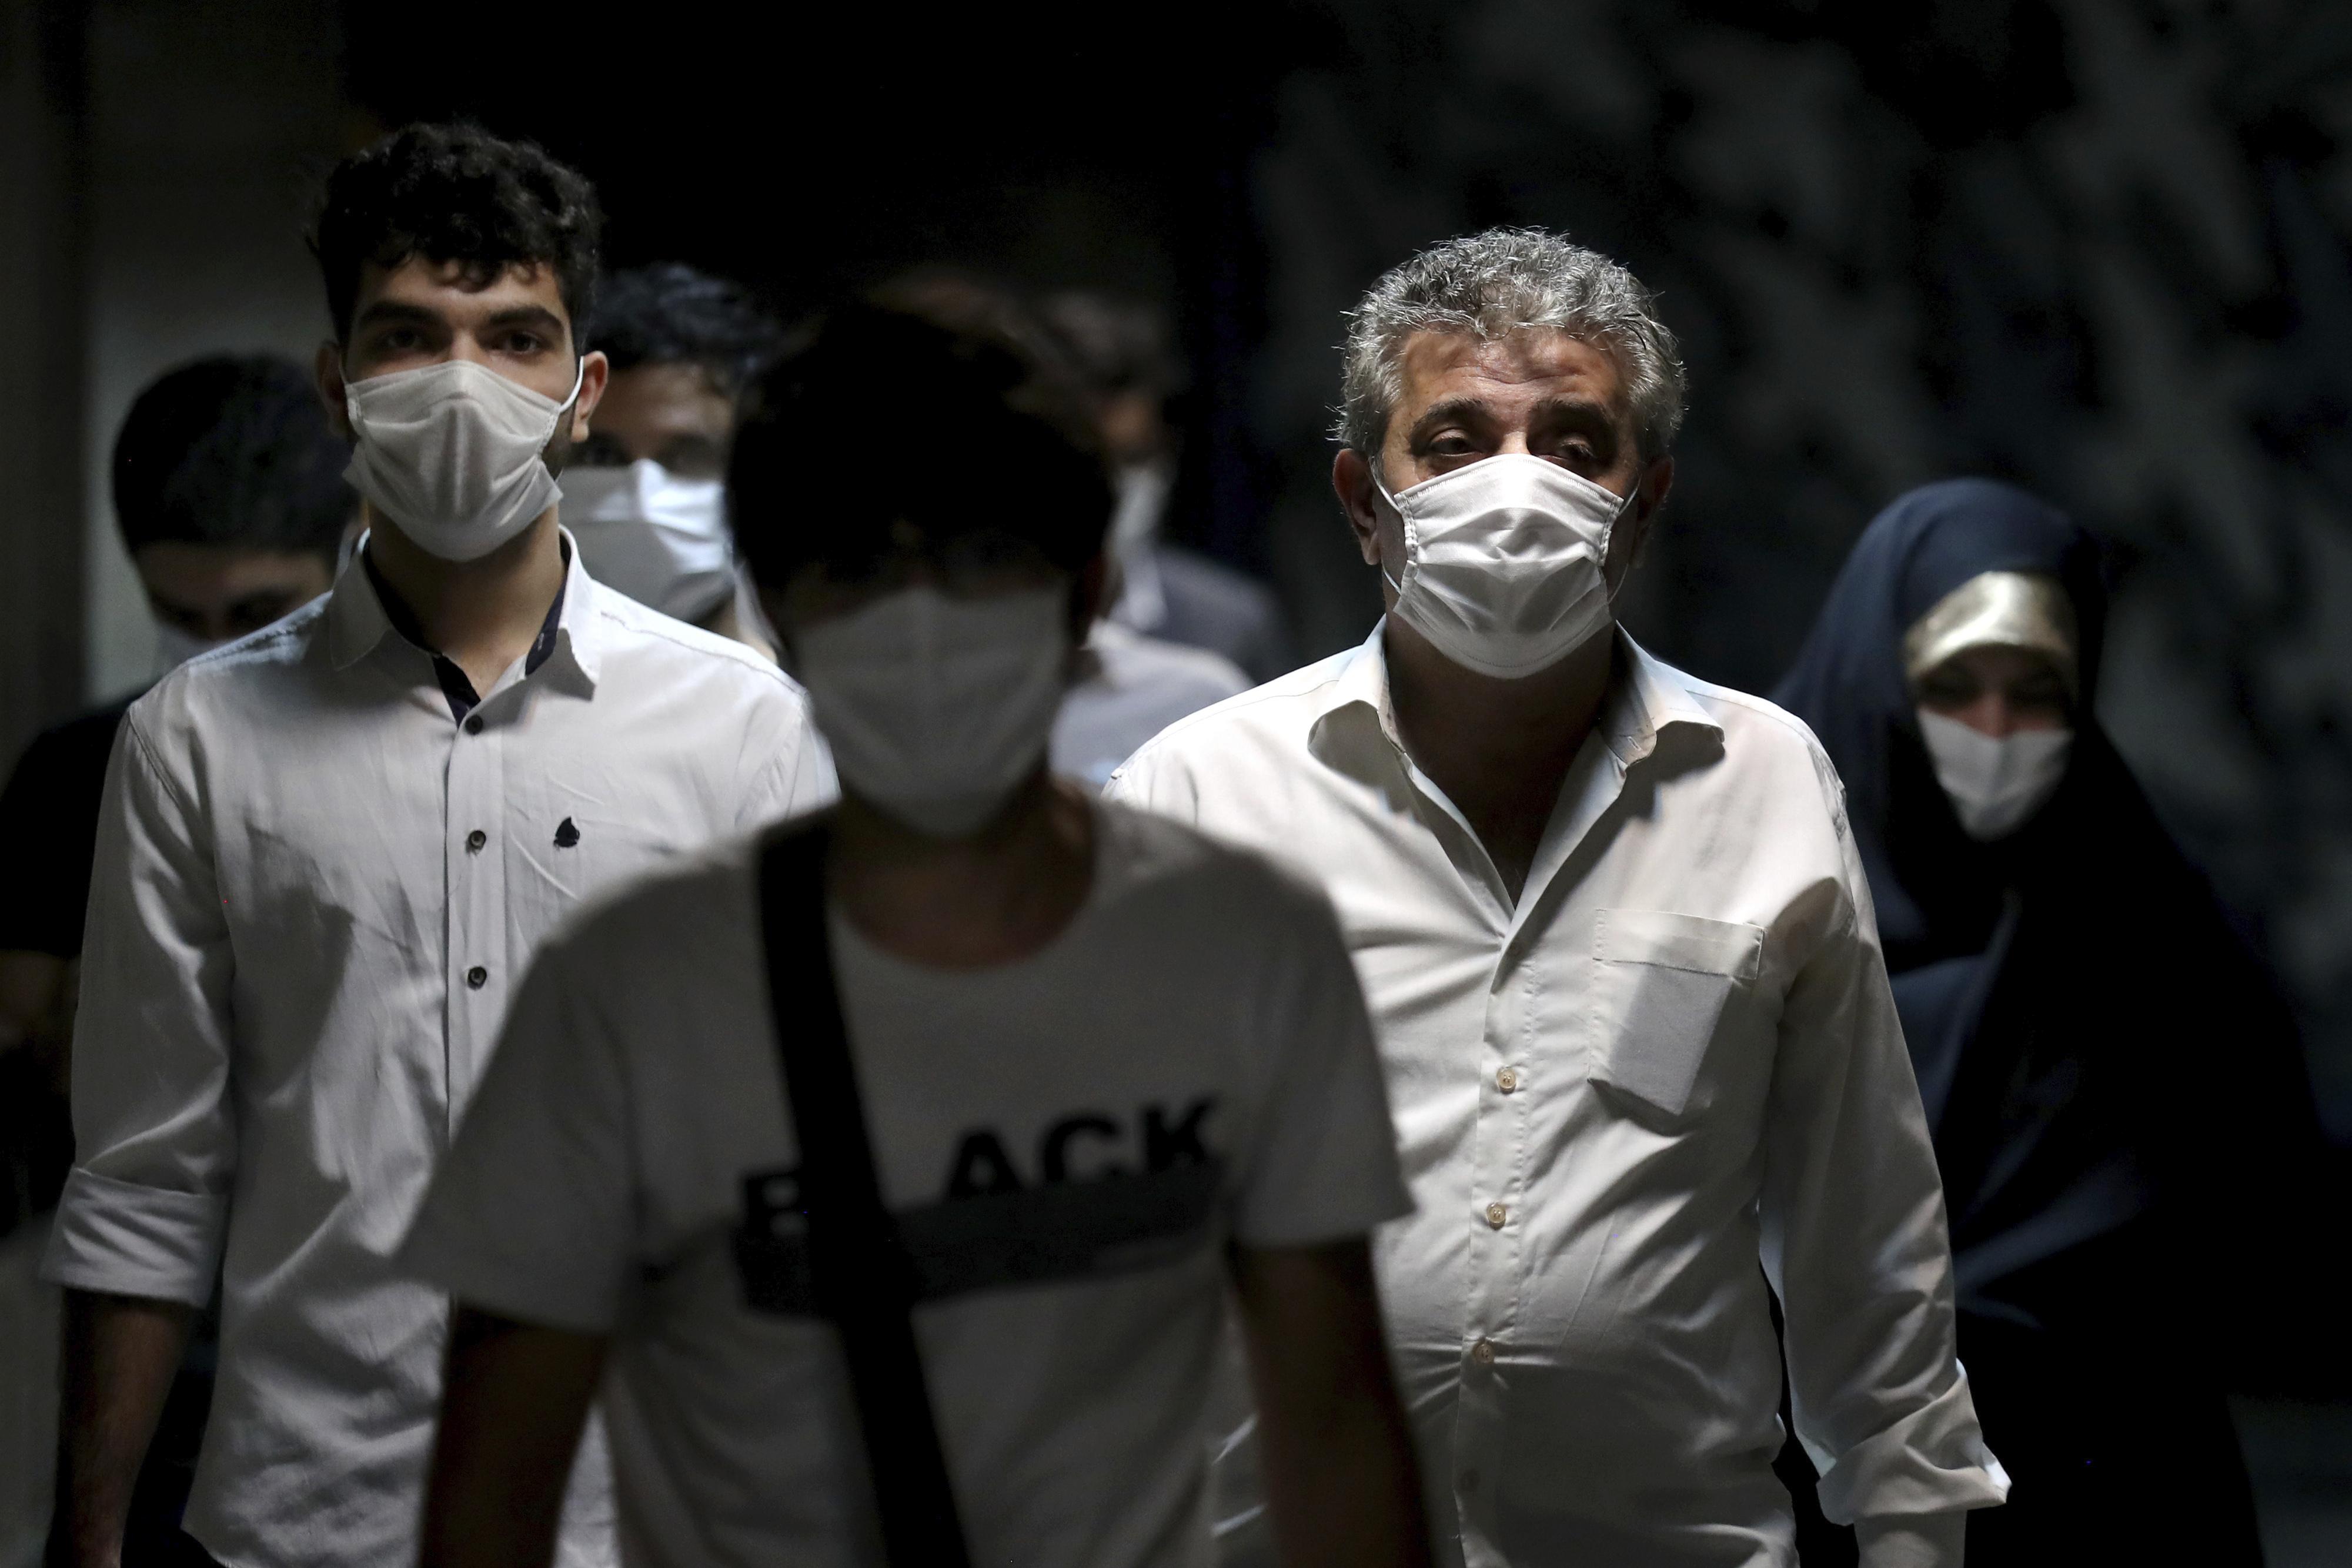 People walk in a metro station in Tehran, Iran, on July 8.